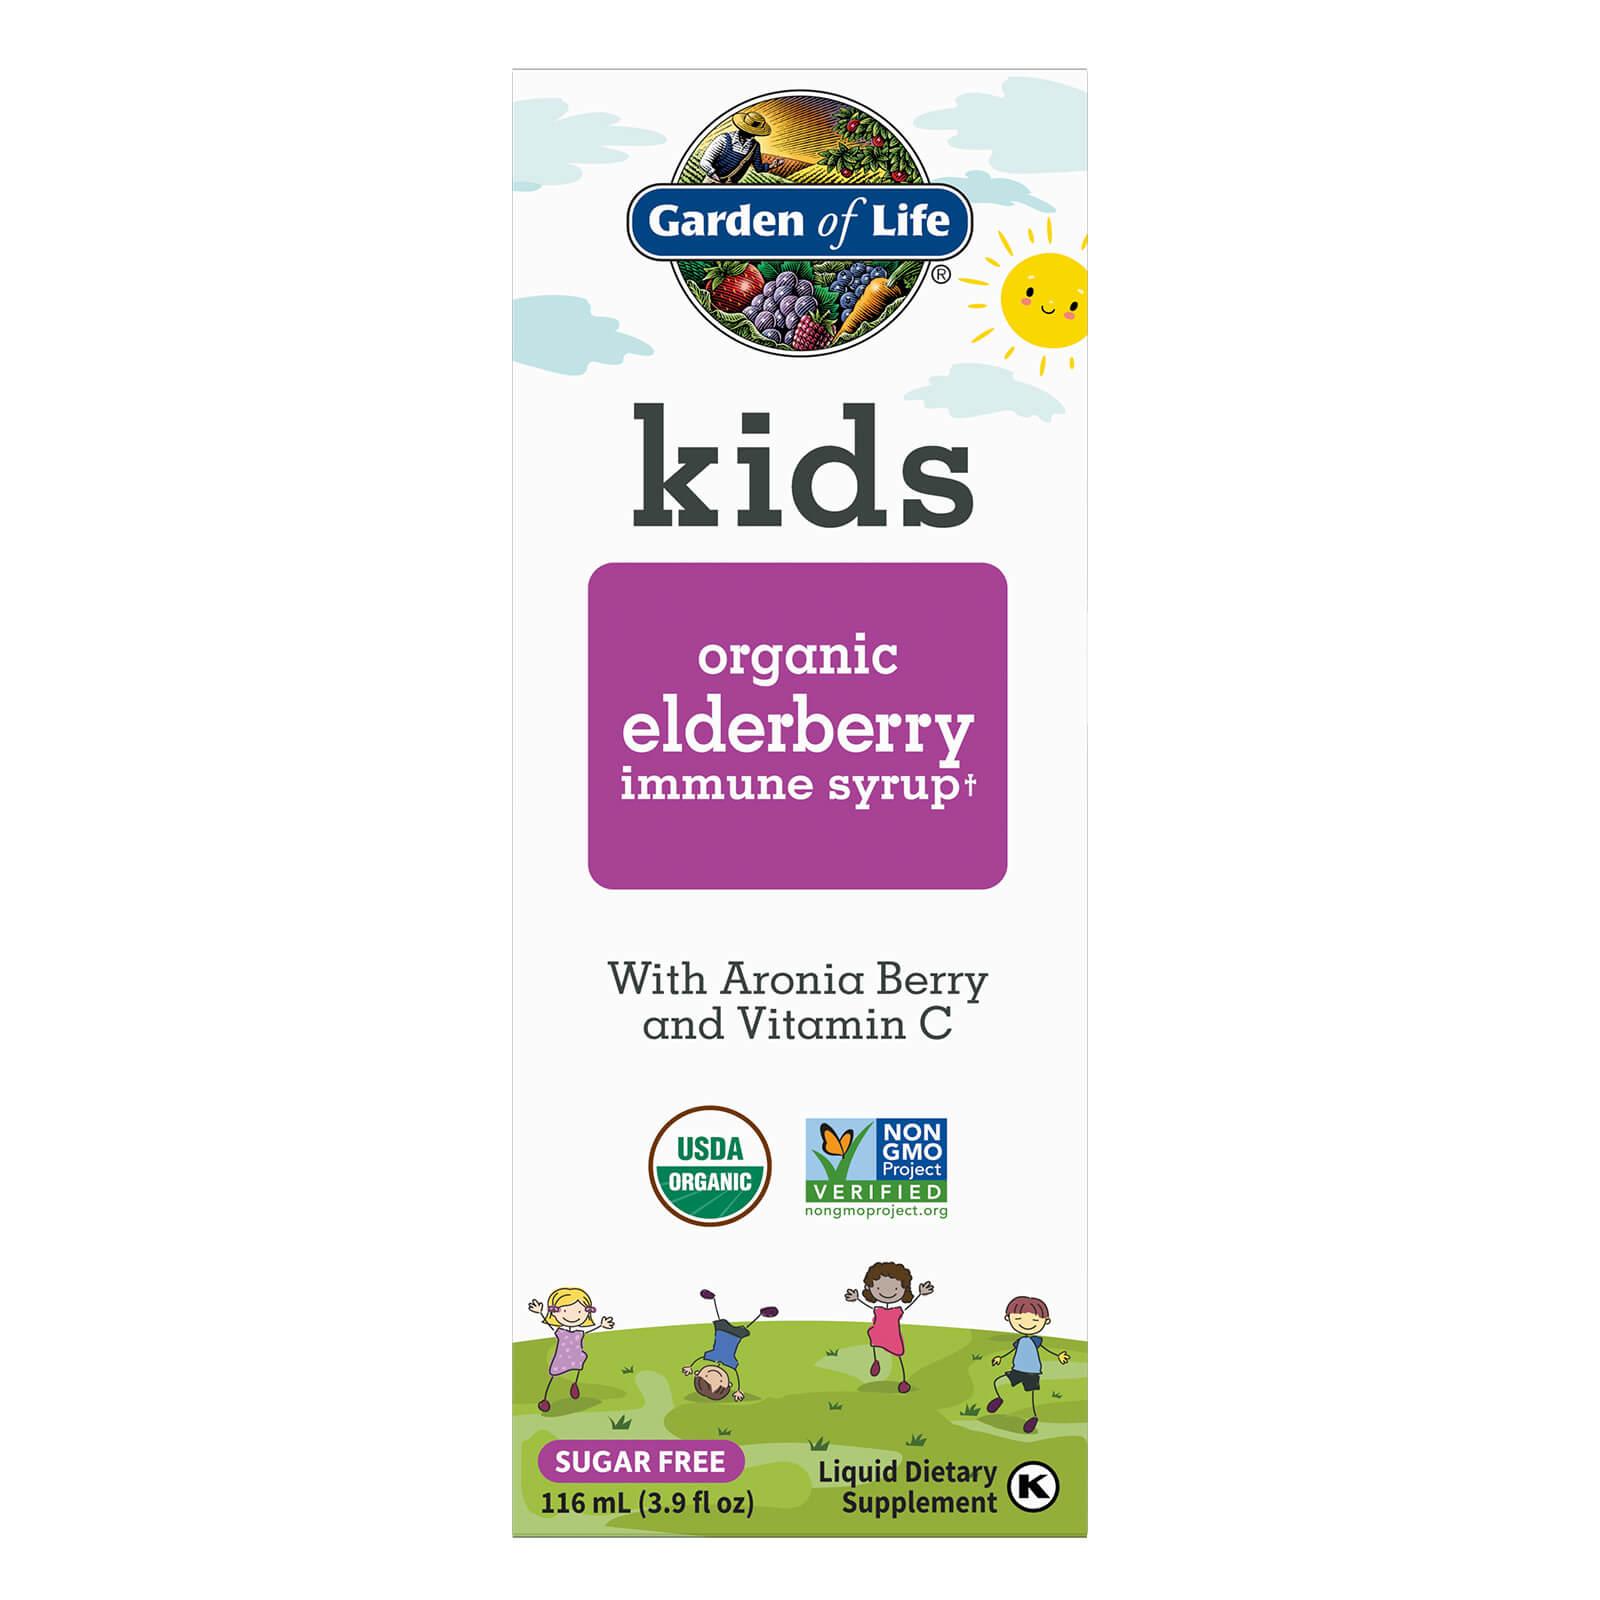 Kids Organic Vlierbessen Immuunsiroop - 116 ml Vloeistof